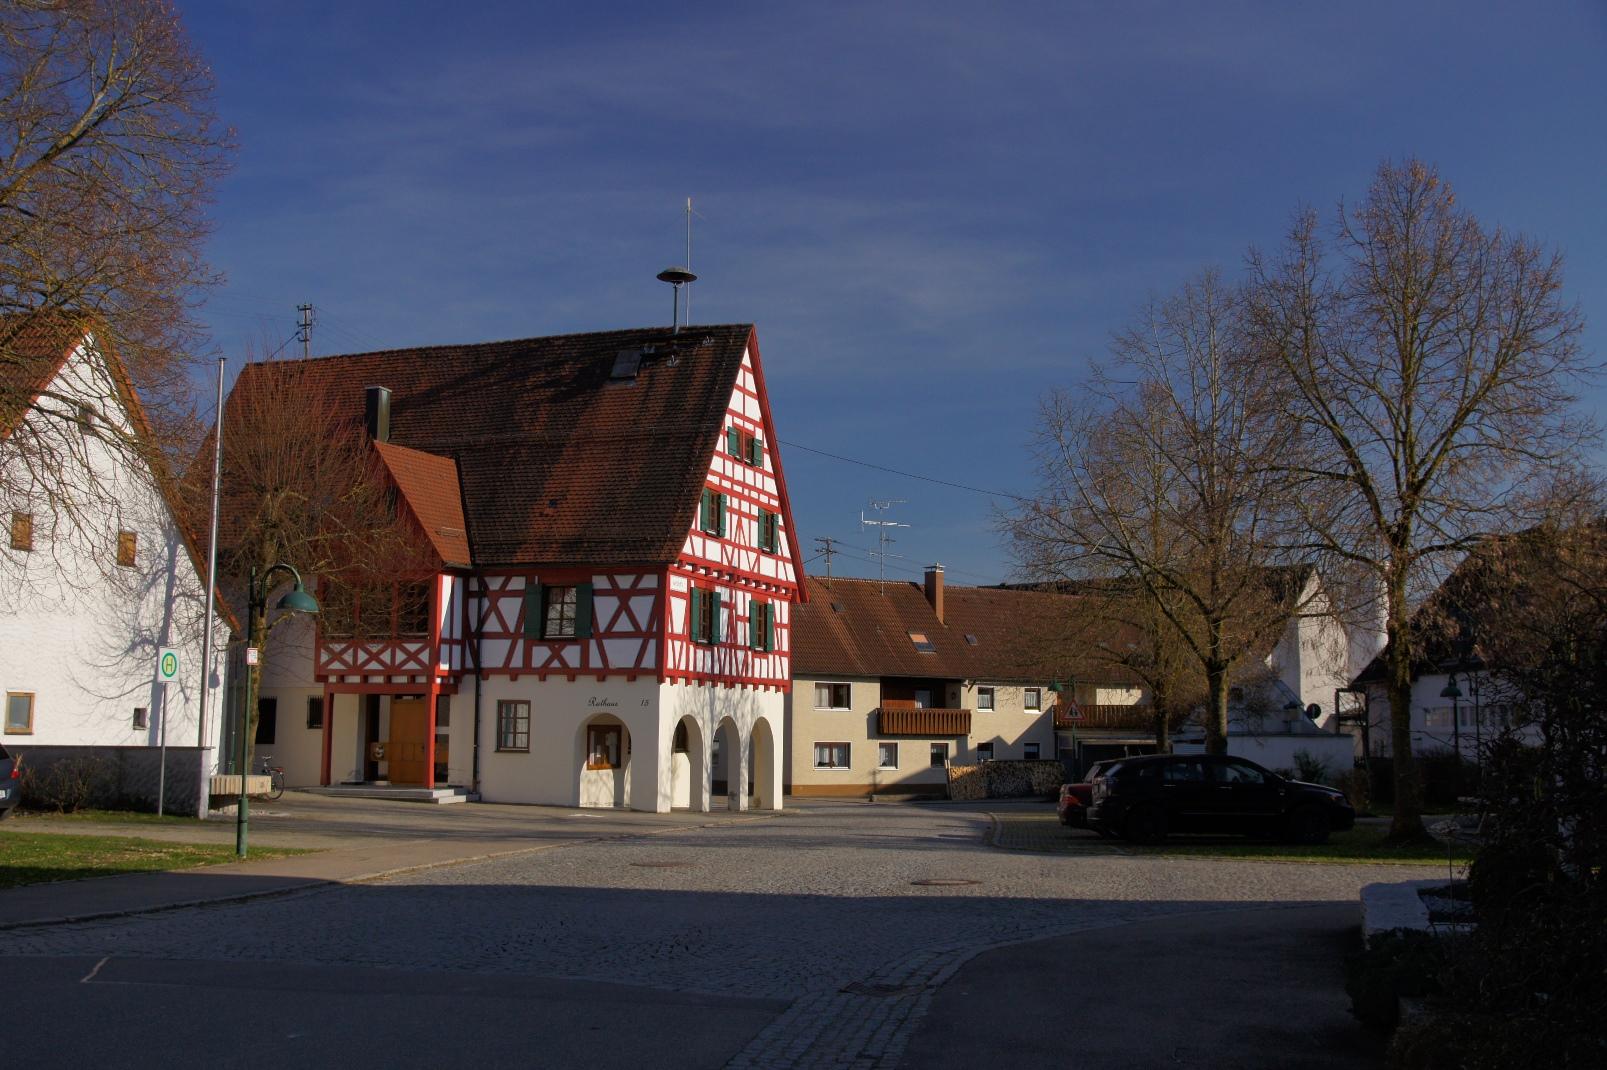 Altheim Alb